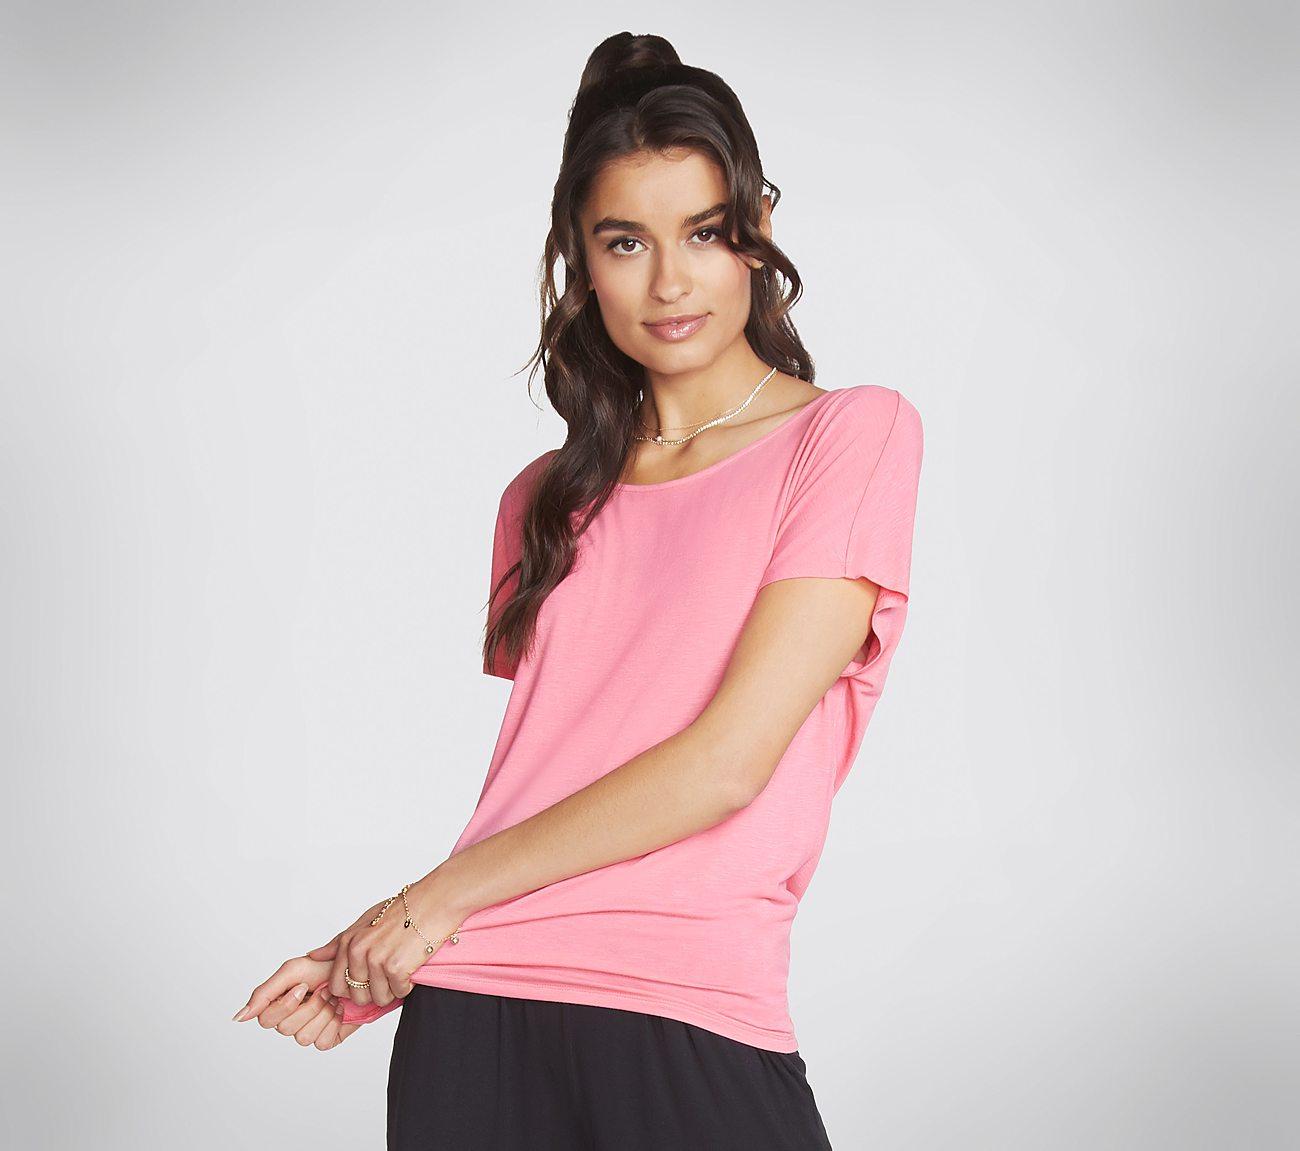 Skechers Apparel Sunkissed Tee Shirt